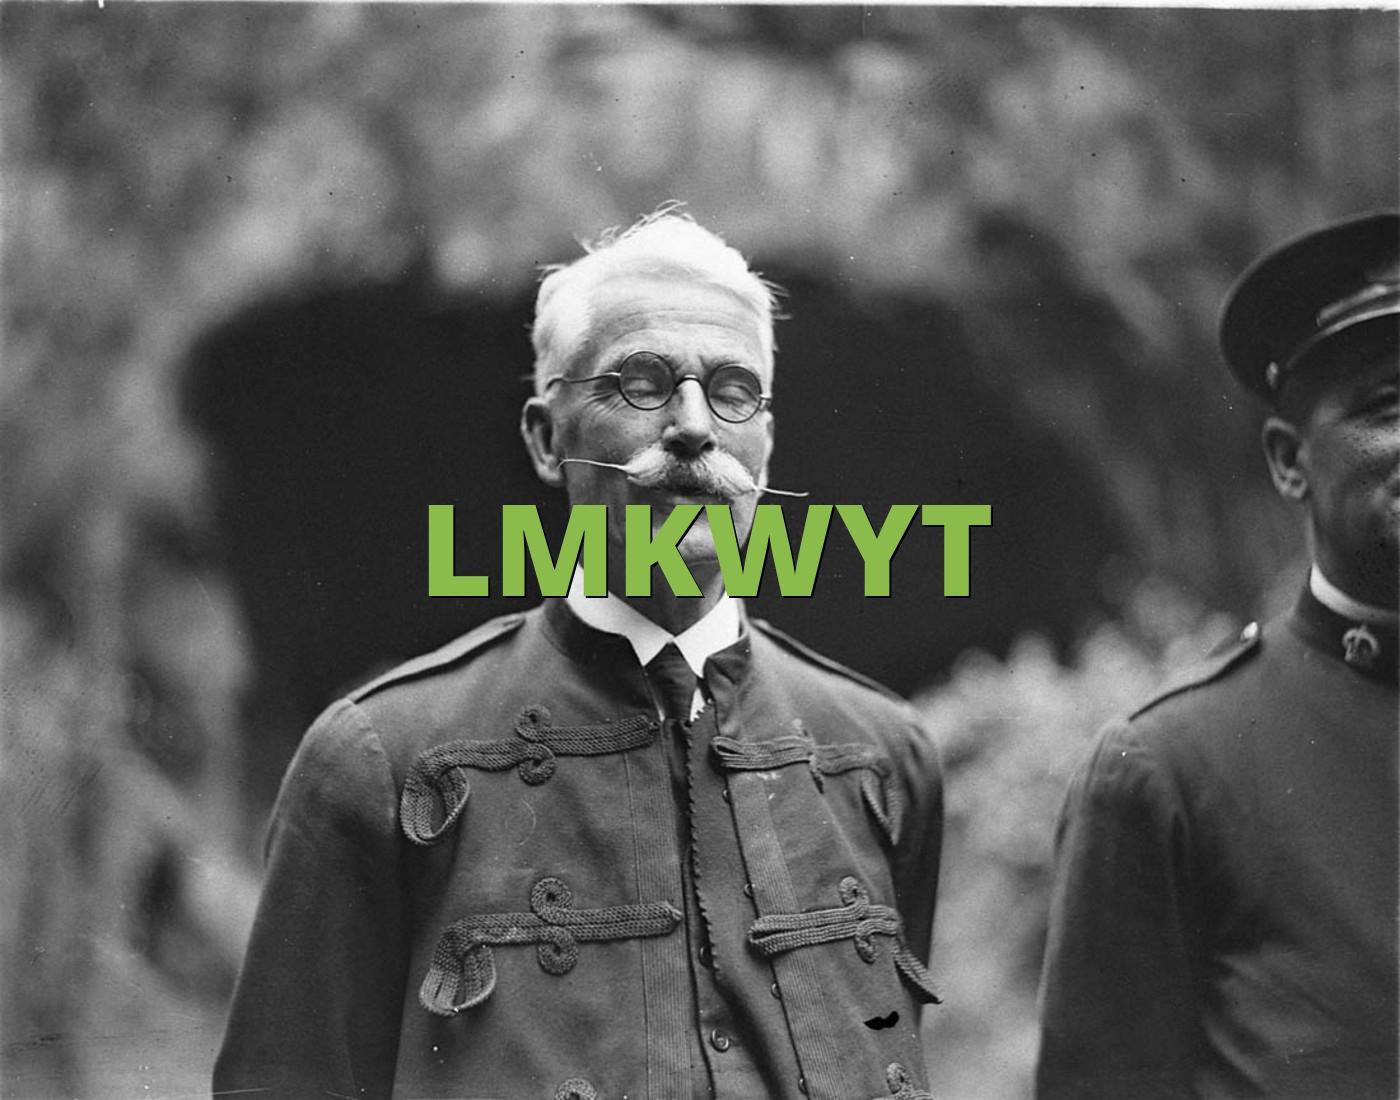 LMKWYT